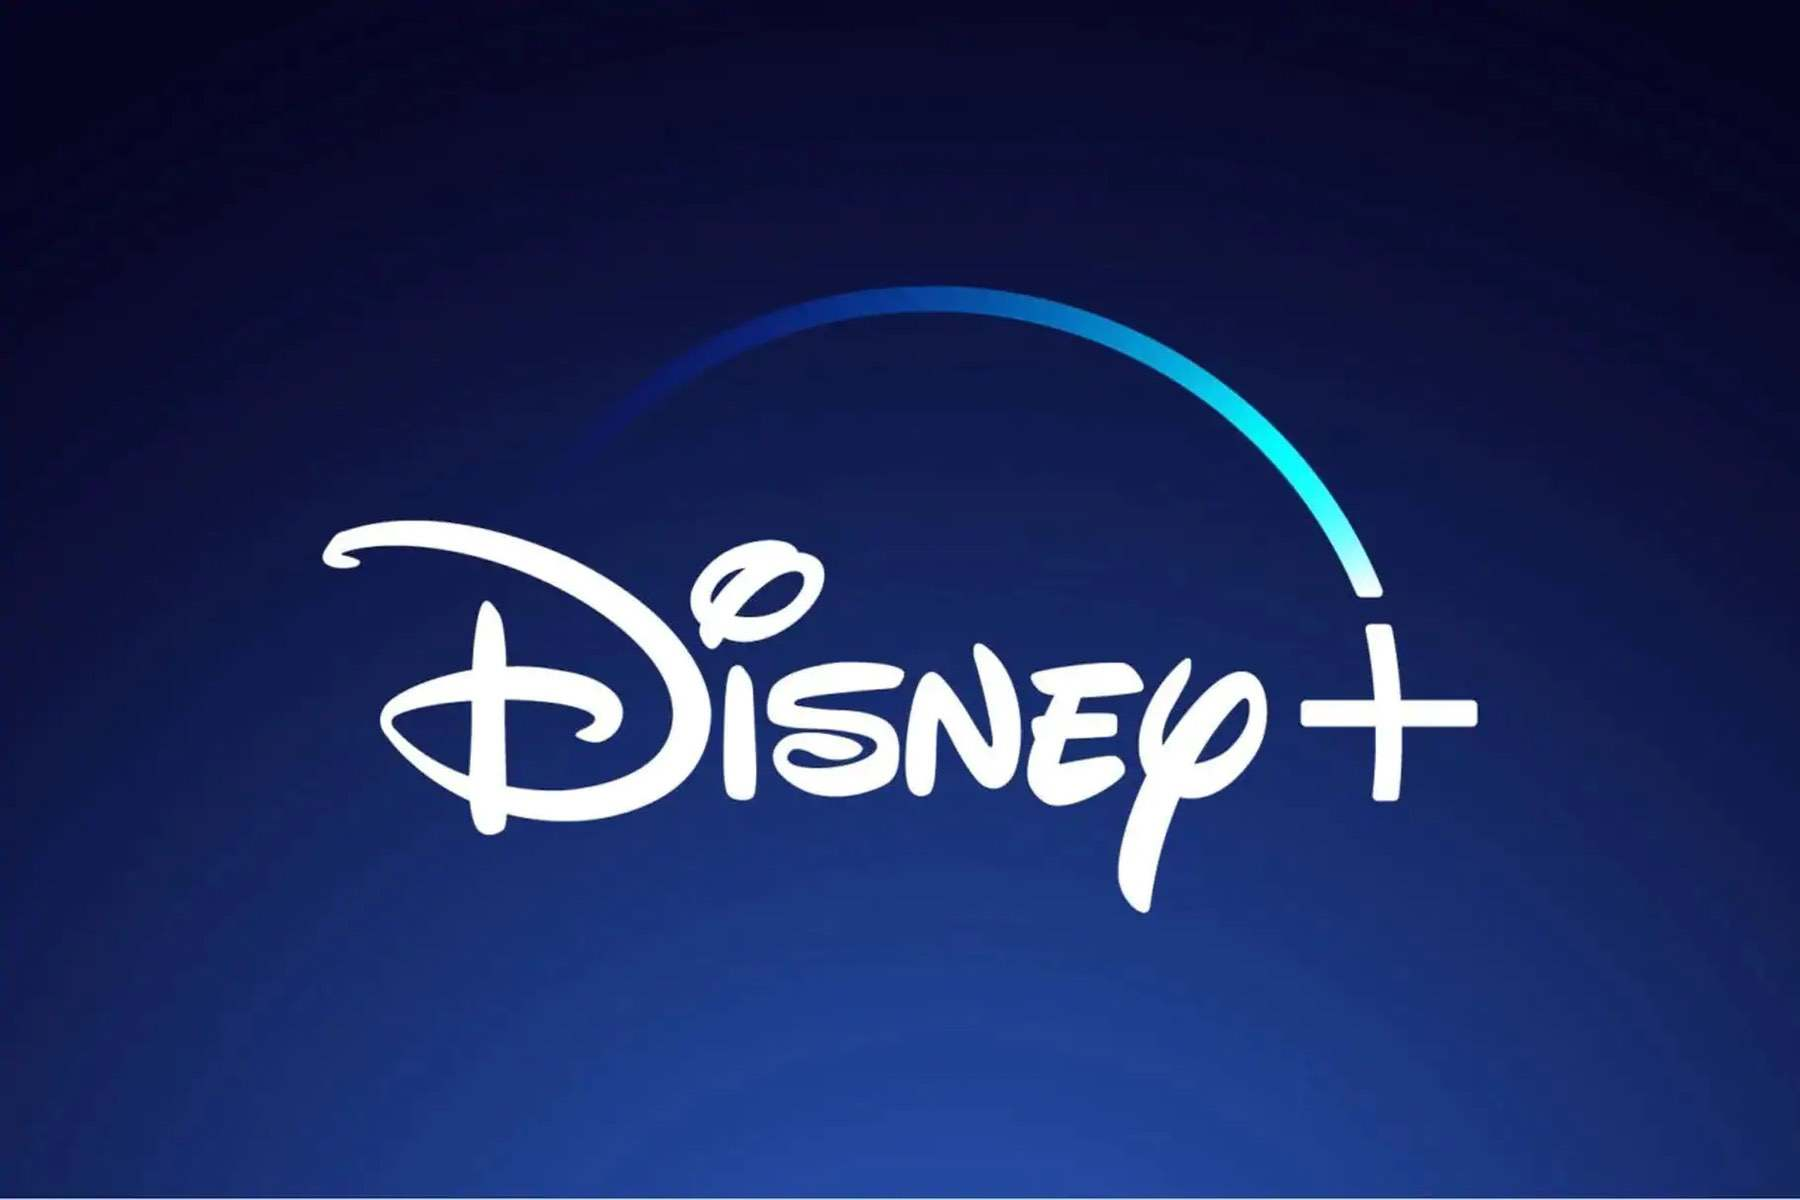 Disney+ – Vorverkauf angekündigt mit vergünstigtem Jahresabo